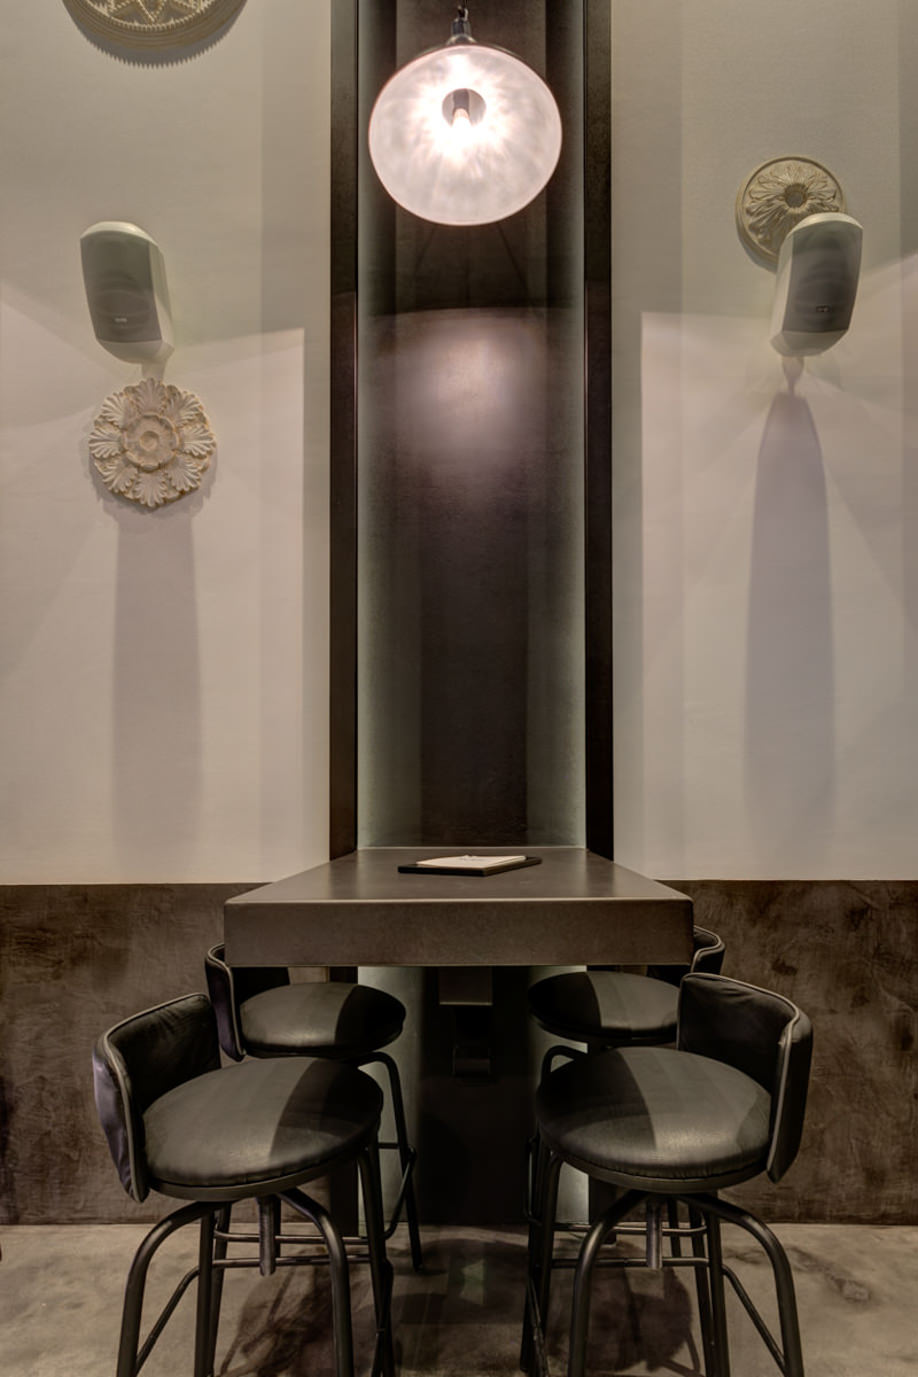 lavaplaster-rook-11